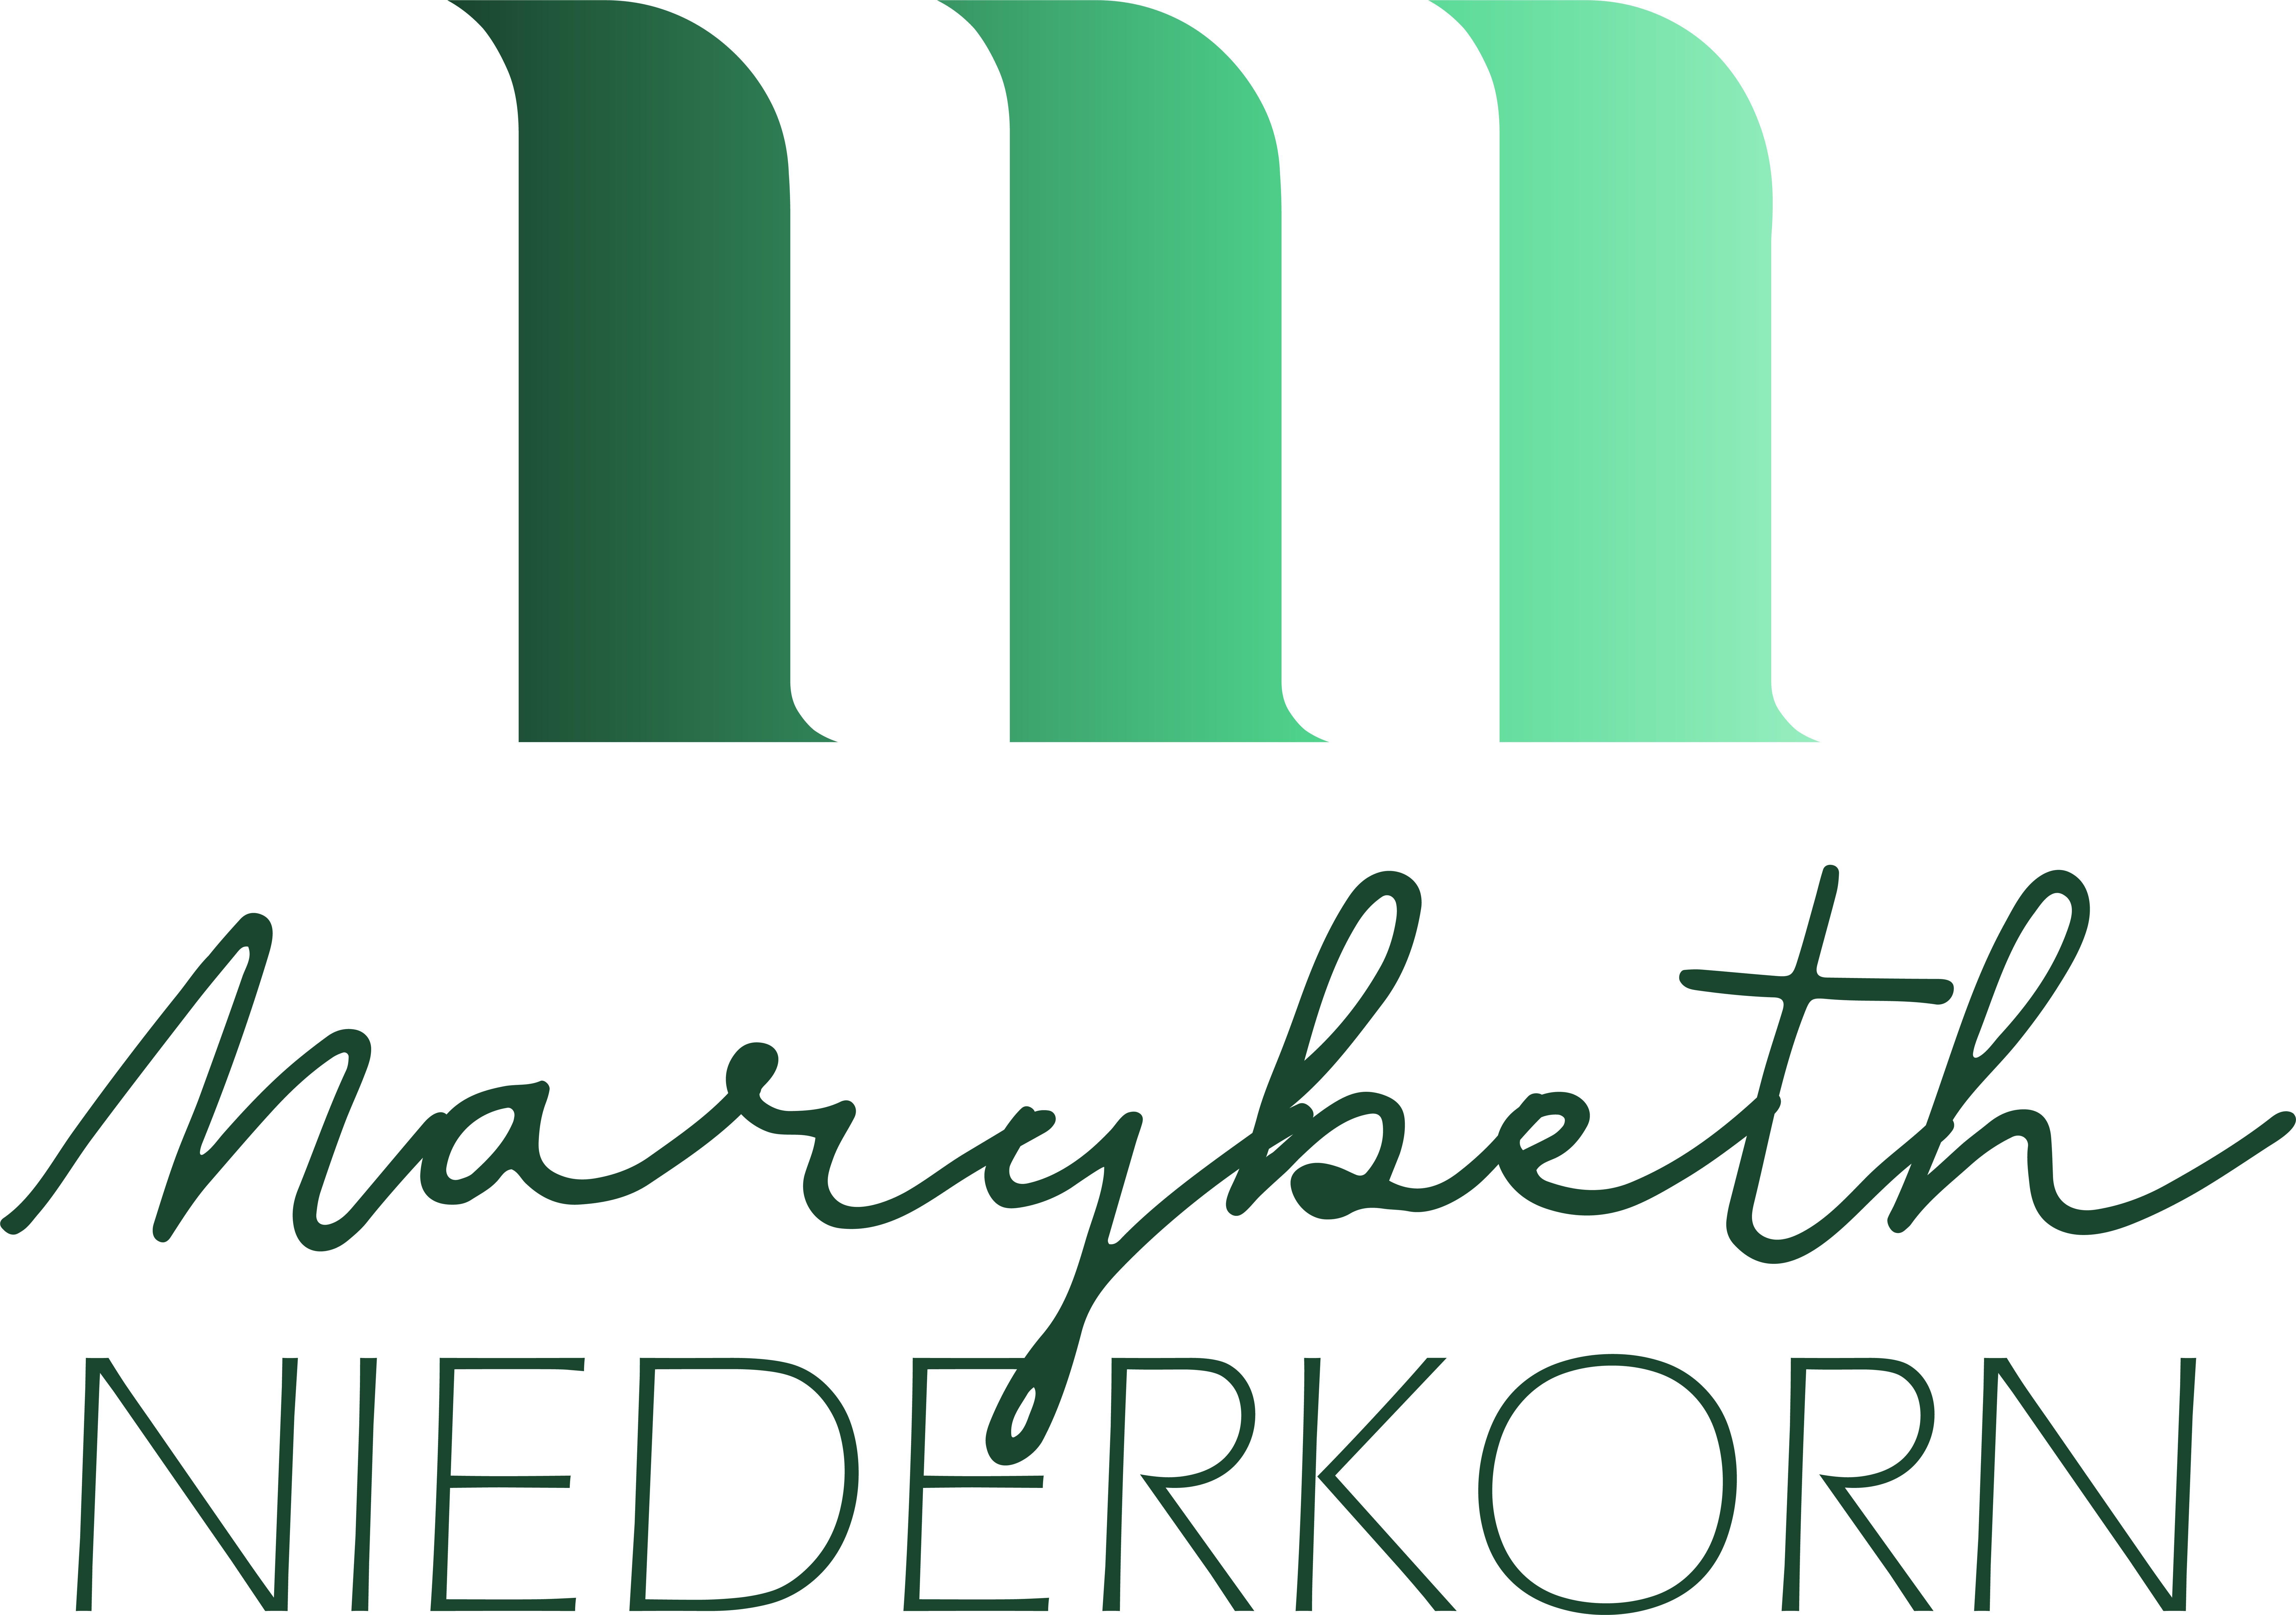 Marybeth Niederkorn